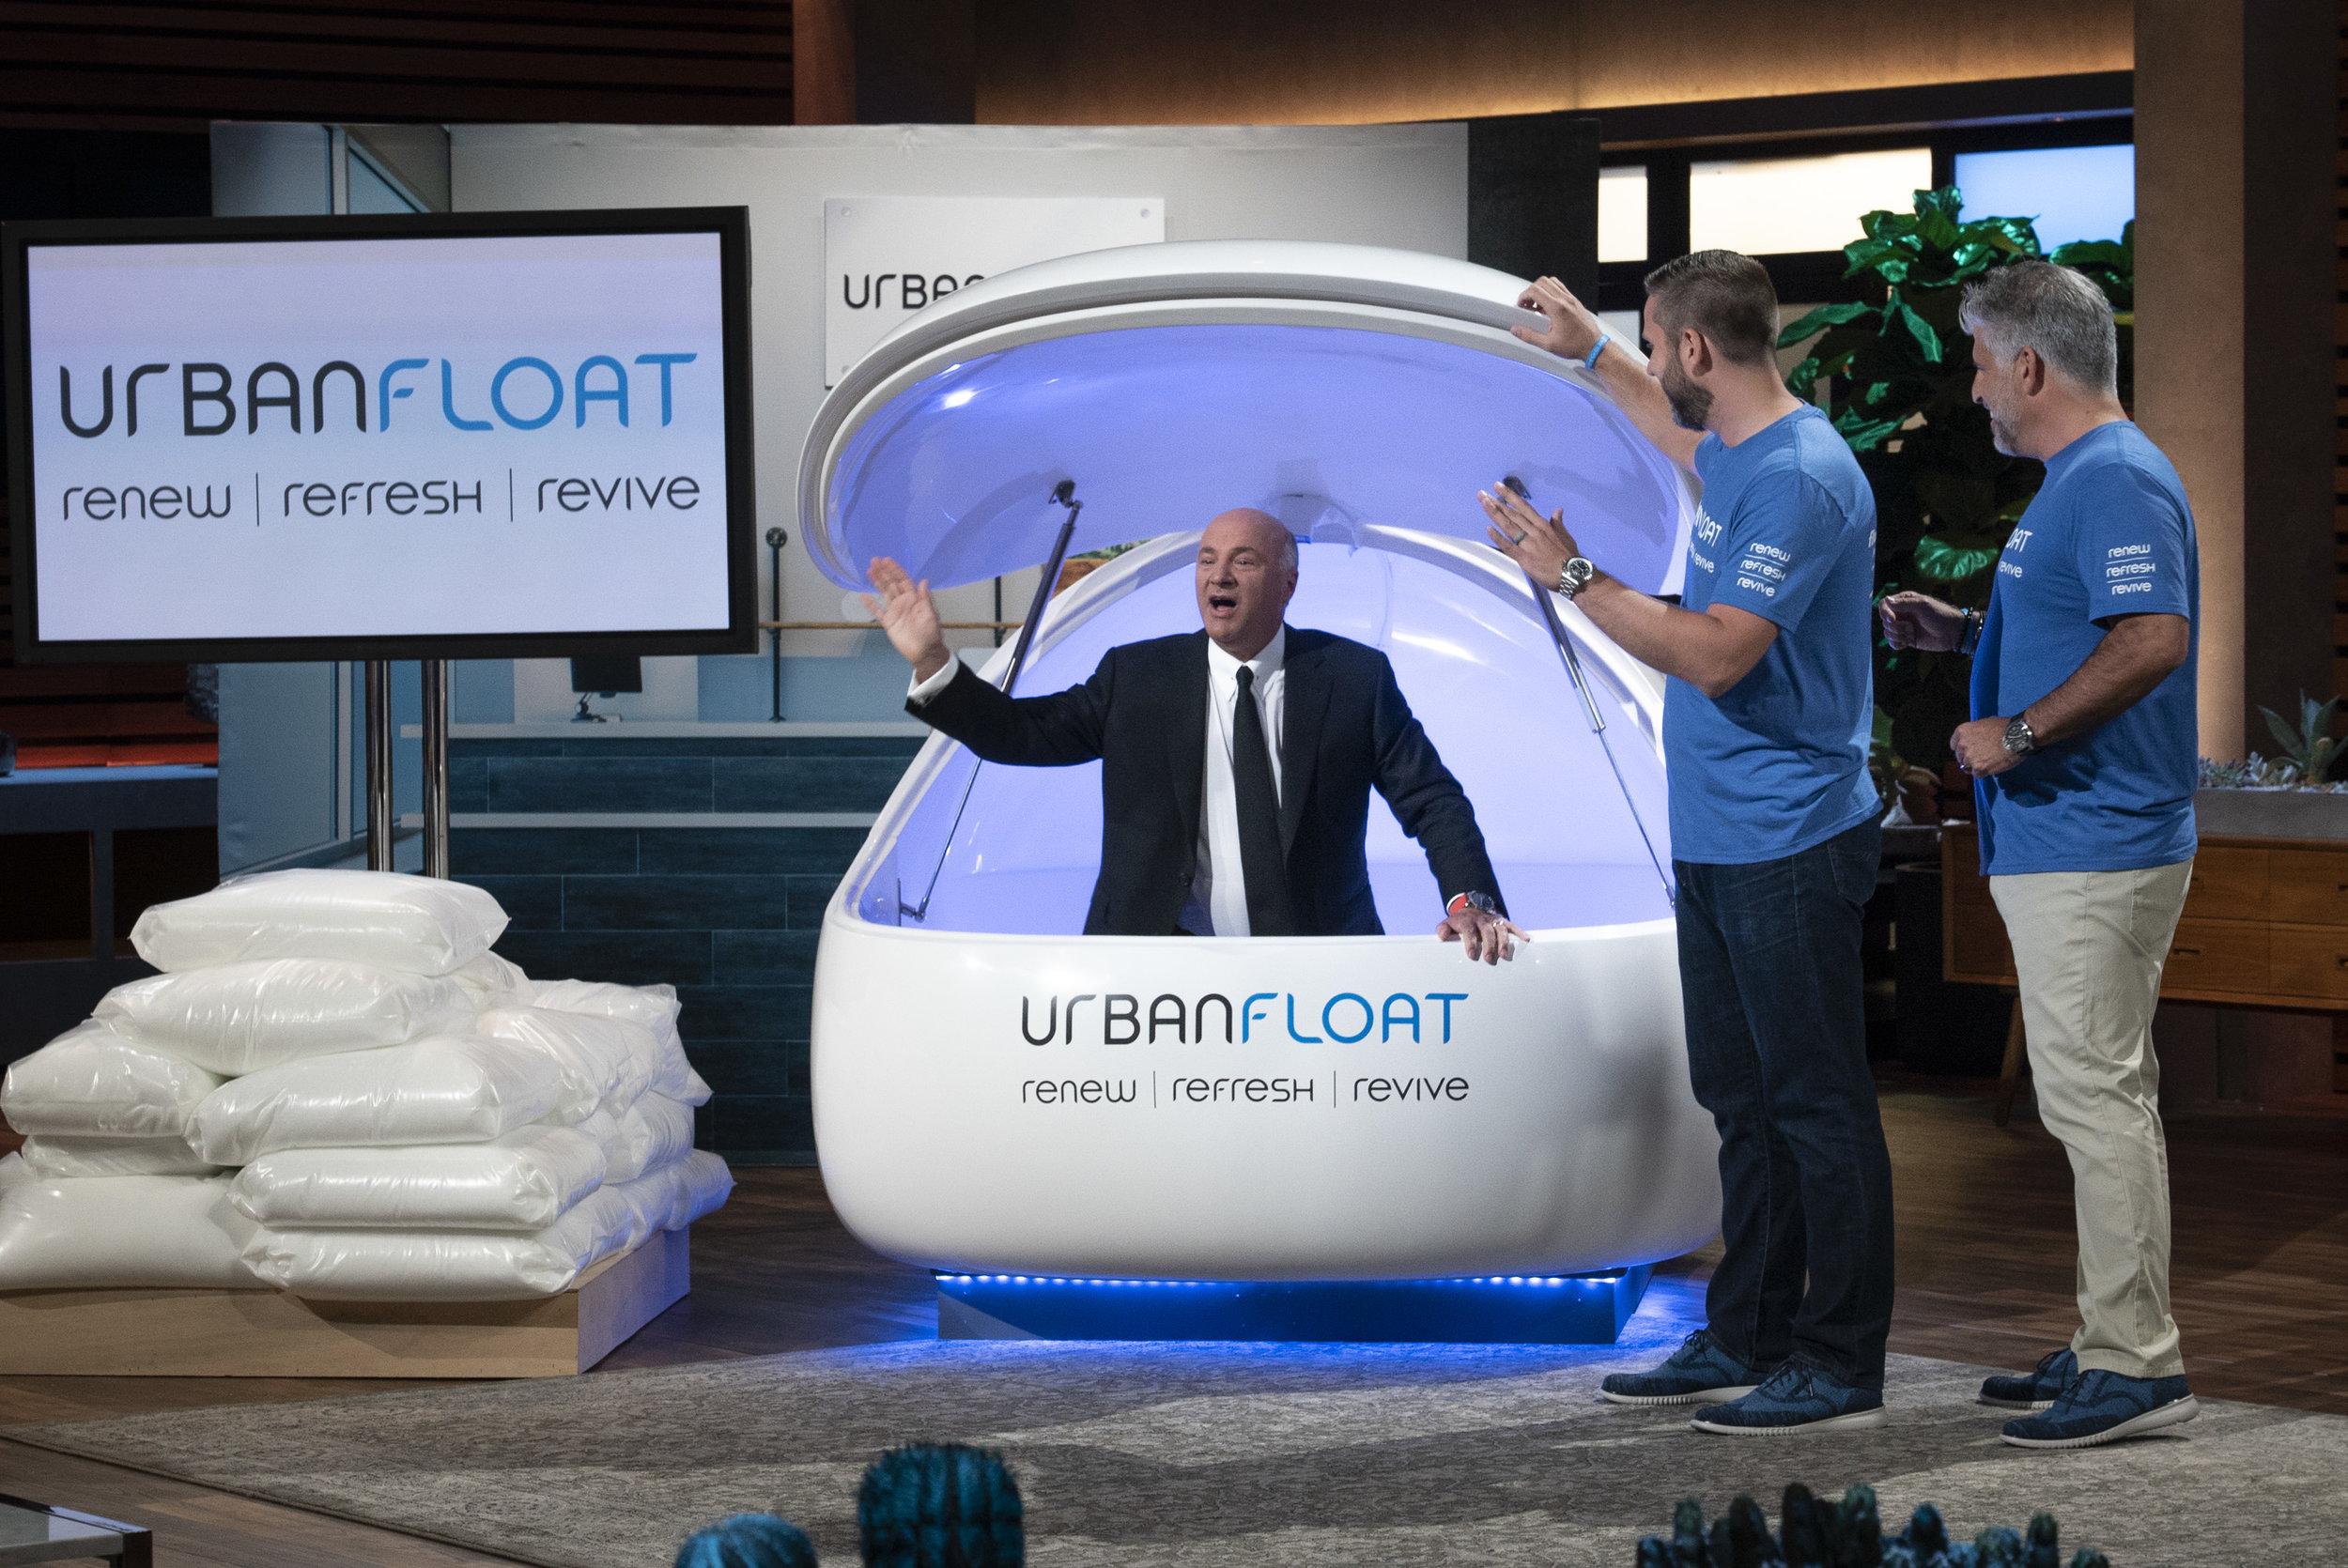 Urban Float Executives to Pitch Company on 'Shark Tank' | Urban